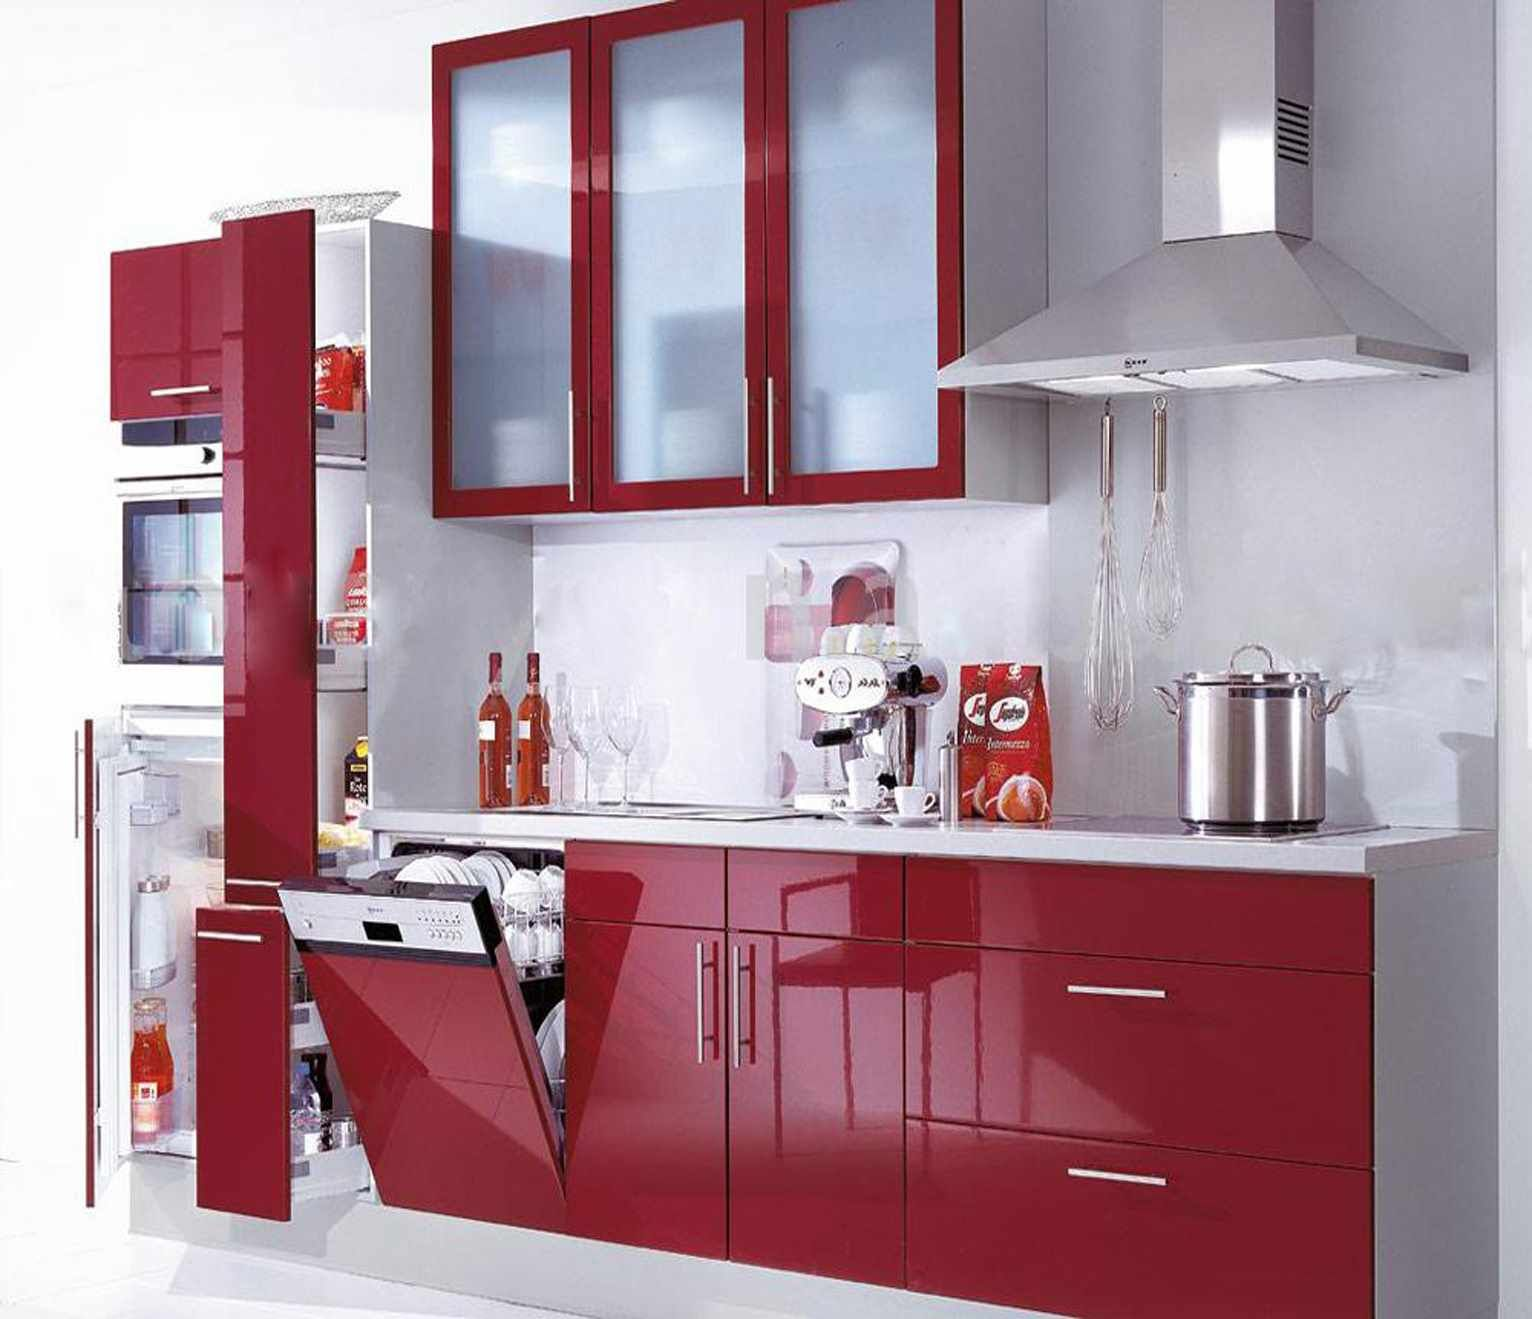 Pin By سنسن On تنسيق Glass Kitchen Cabinet Doors Modern White Kitchen Cabinets Kitchen Cabinets